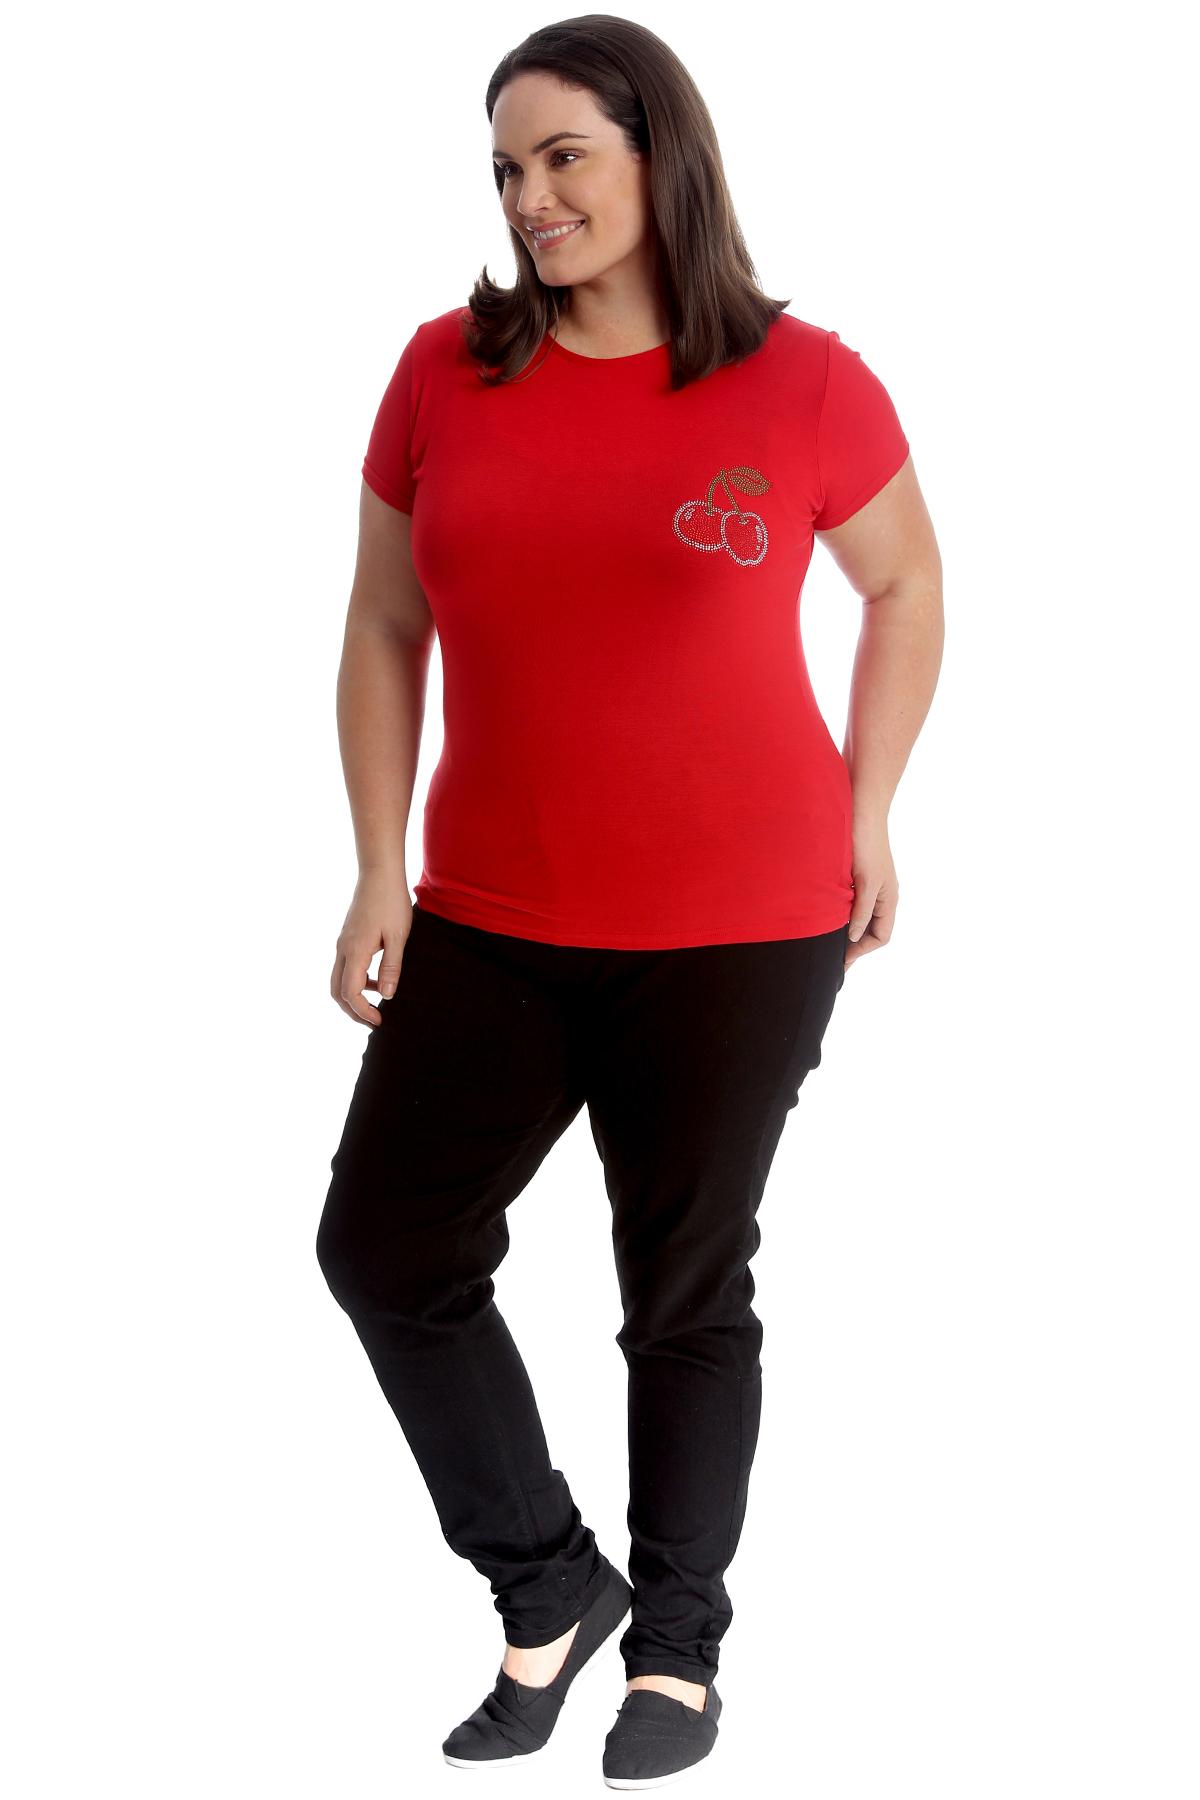 New-Womens-Plus-Size-Top-Ladies-Cherry-Rhinestone-T-Shirt-Soft-Stud-Shiny-Hip thumbnail 13